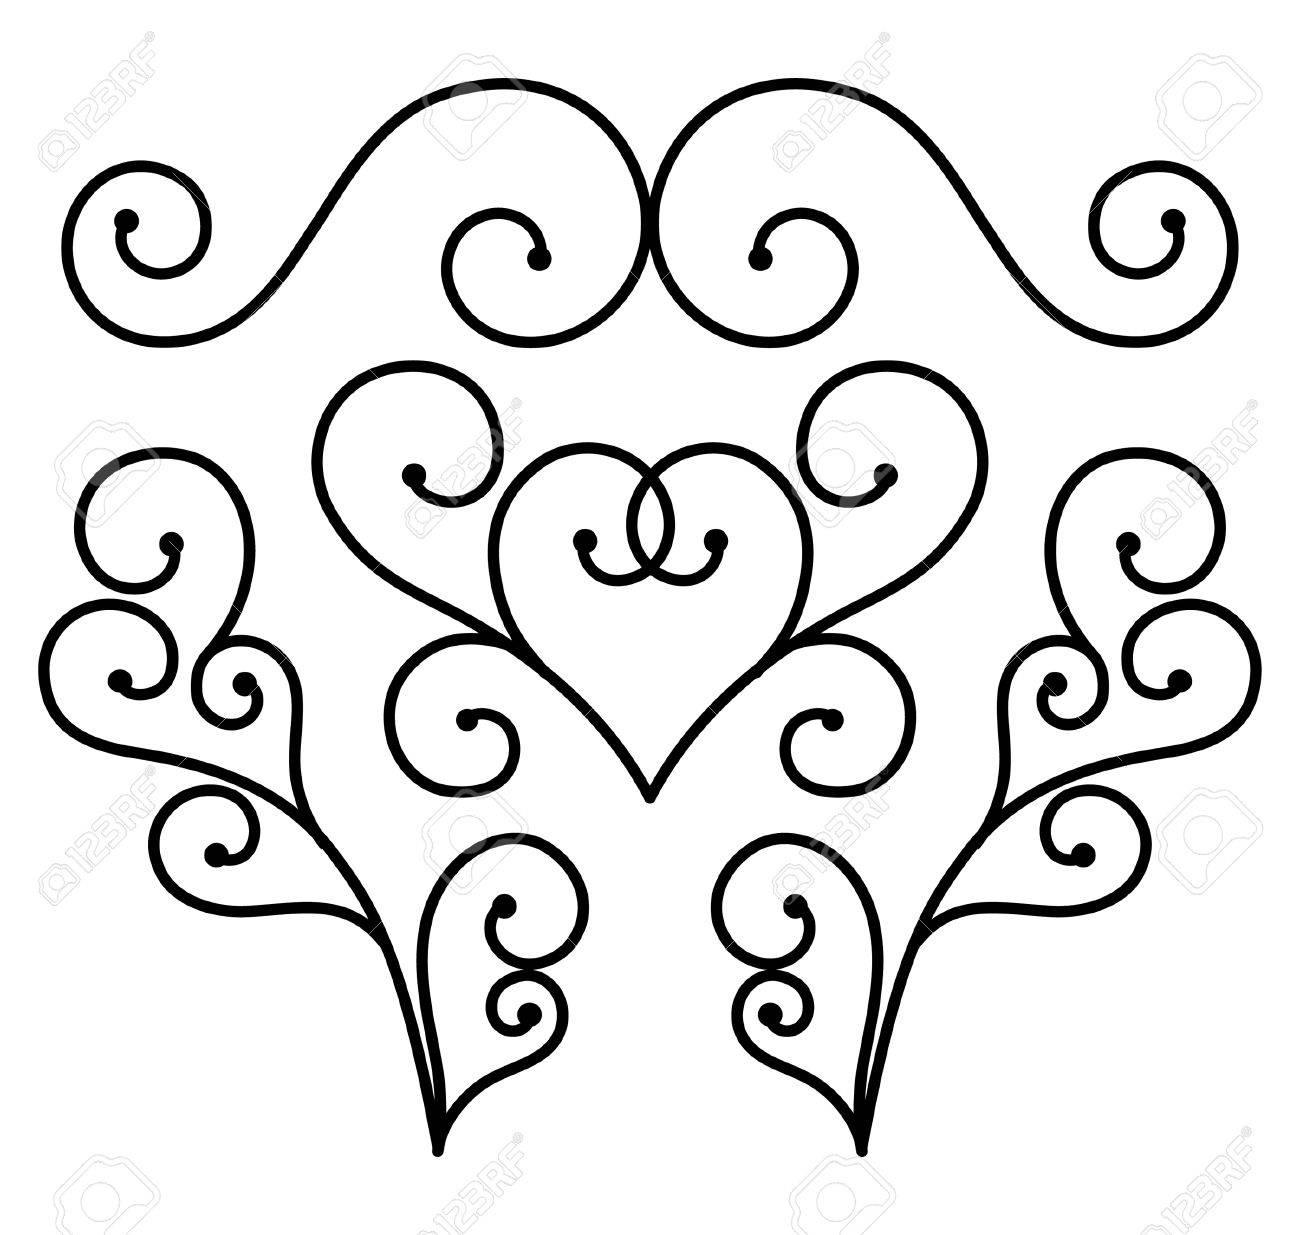 flourishes of ornament vertor royalty free cliparts vectors and rh 123rf com retro flourishes vector retro flourishes vector